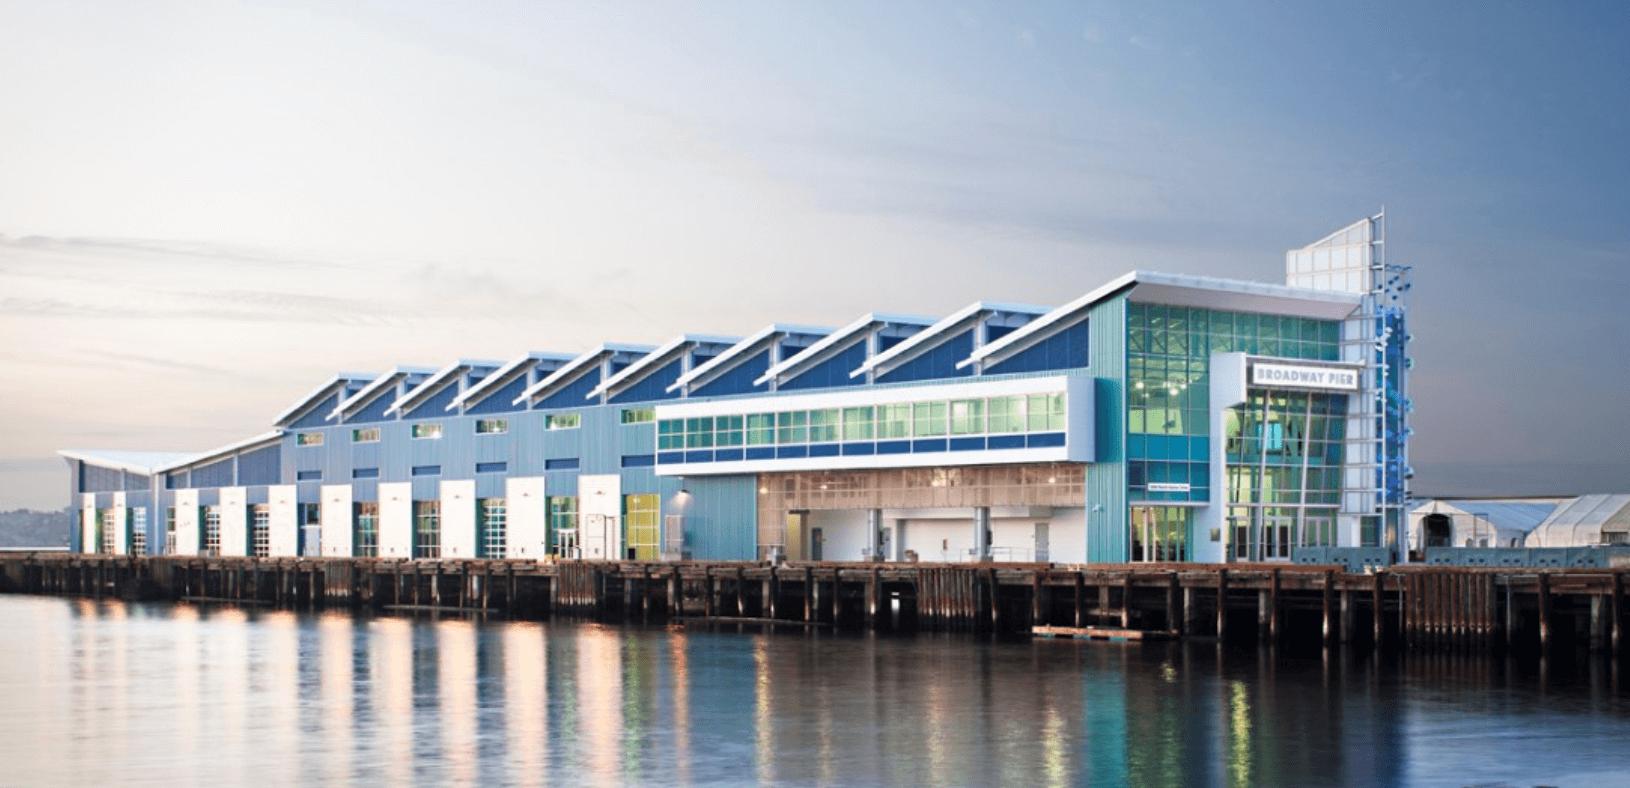 The Port Pavilion - The gReat Cut